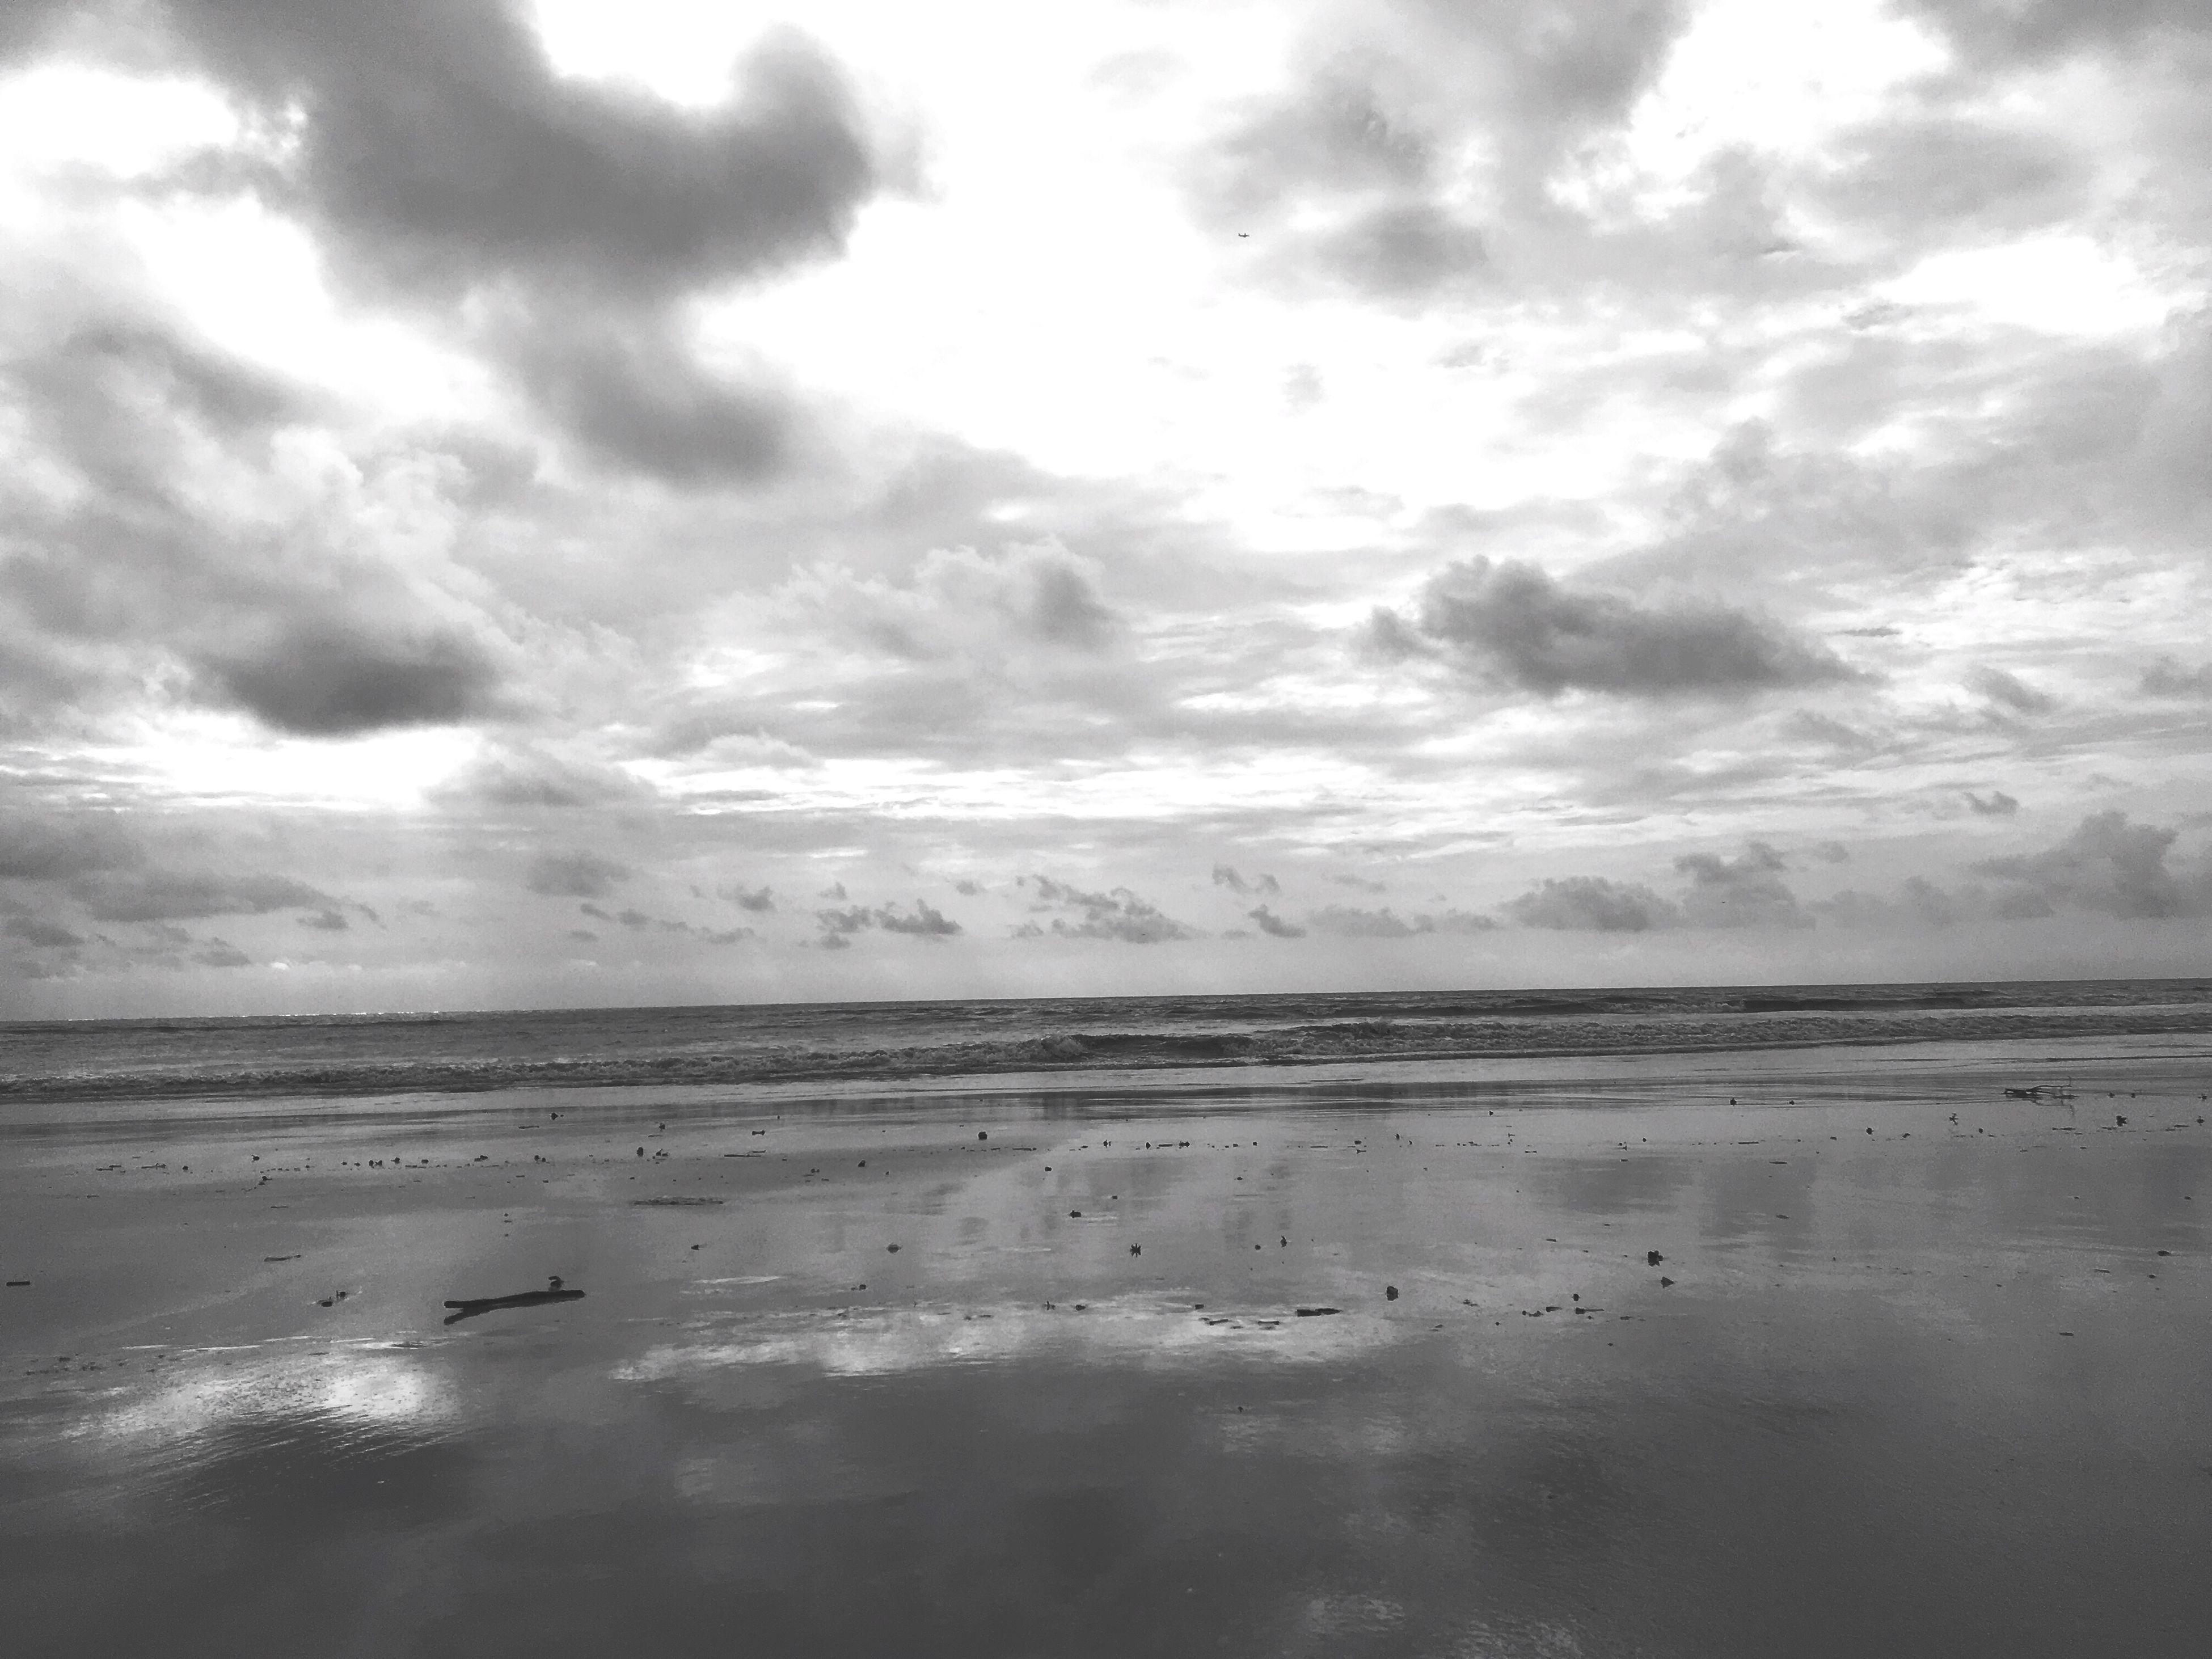 horizon over water, sea, water, beach, tranquil scene, tranquility, scenics, calm, sky, shore, ocean, beauty in nature, idyllic, cloud, cloudy, cloud - sky, coastline, seascape, nature, majestic, remote, cloudscape, vacations, waterfront, no people, non-urban scene, dramatic sky, solitude